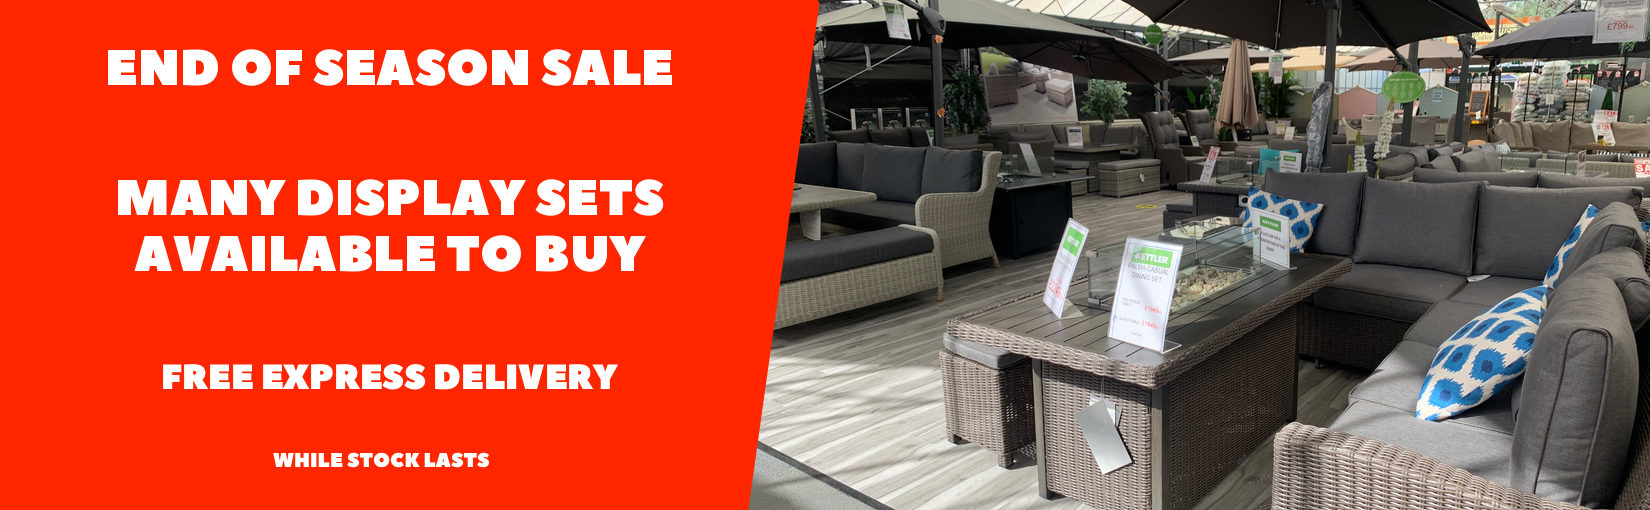 1650X510 End Of Season Sale Furniture